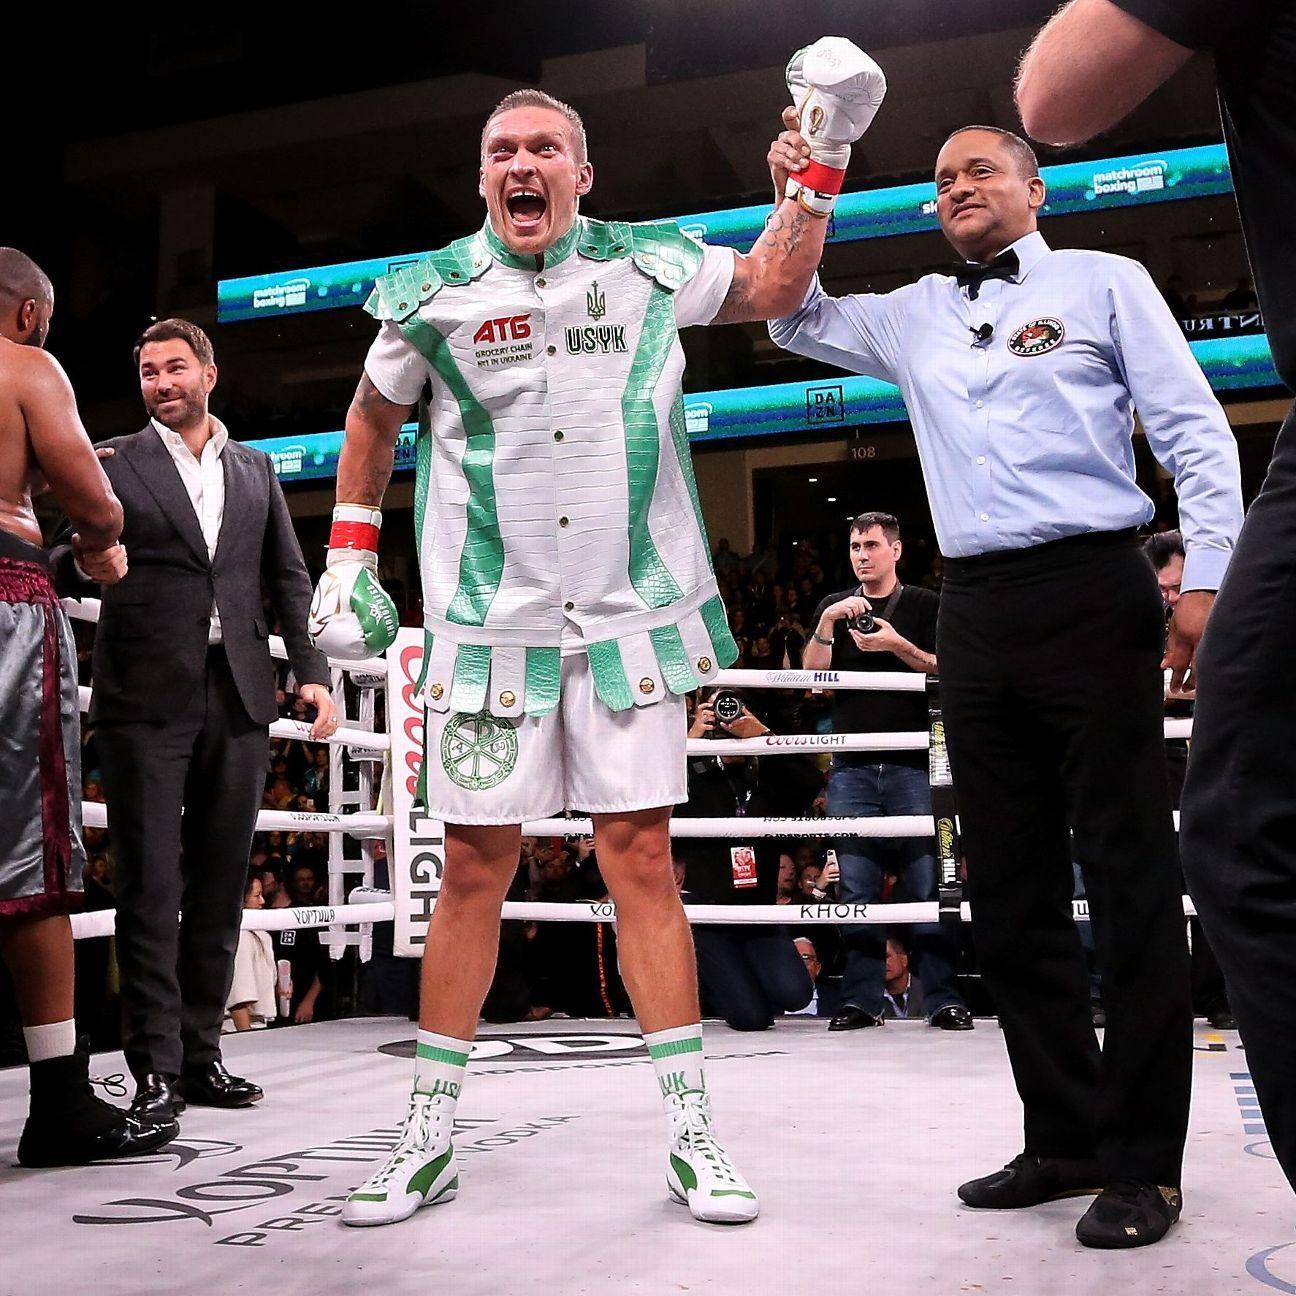 Anthony Joshua wary of southpaw Oleksandr Usyk ahead of world title defense